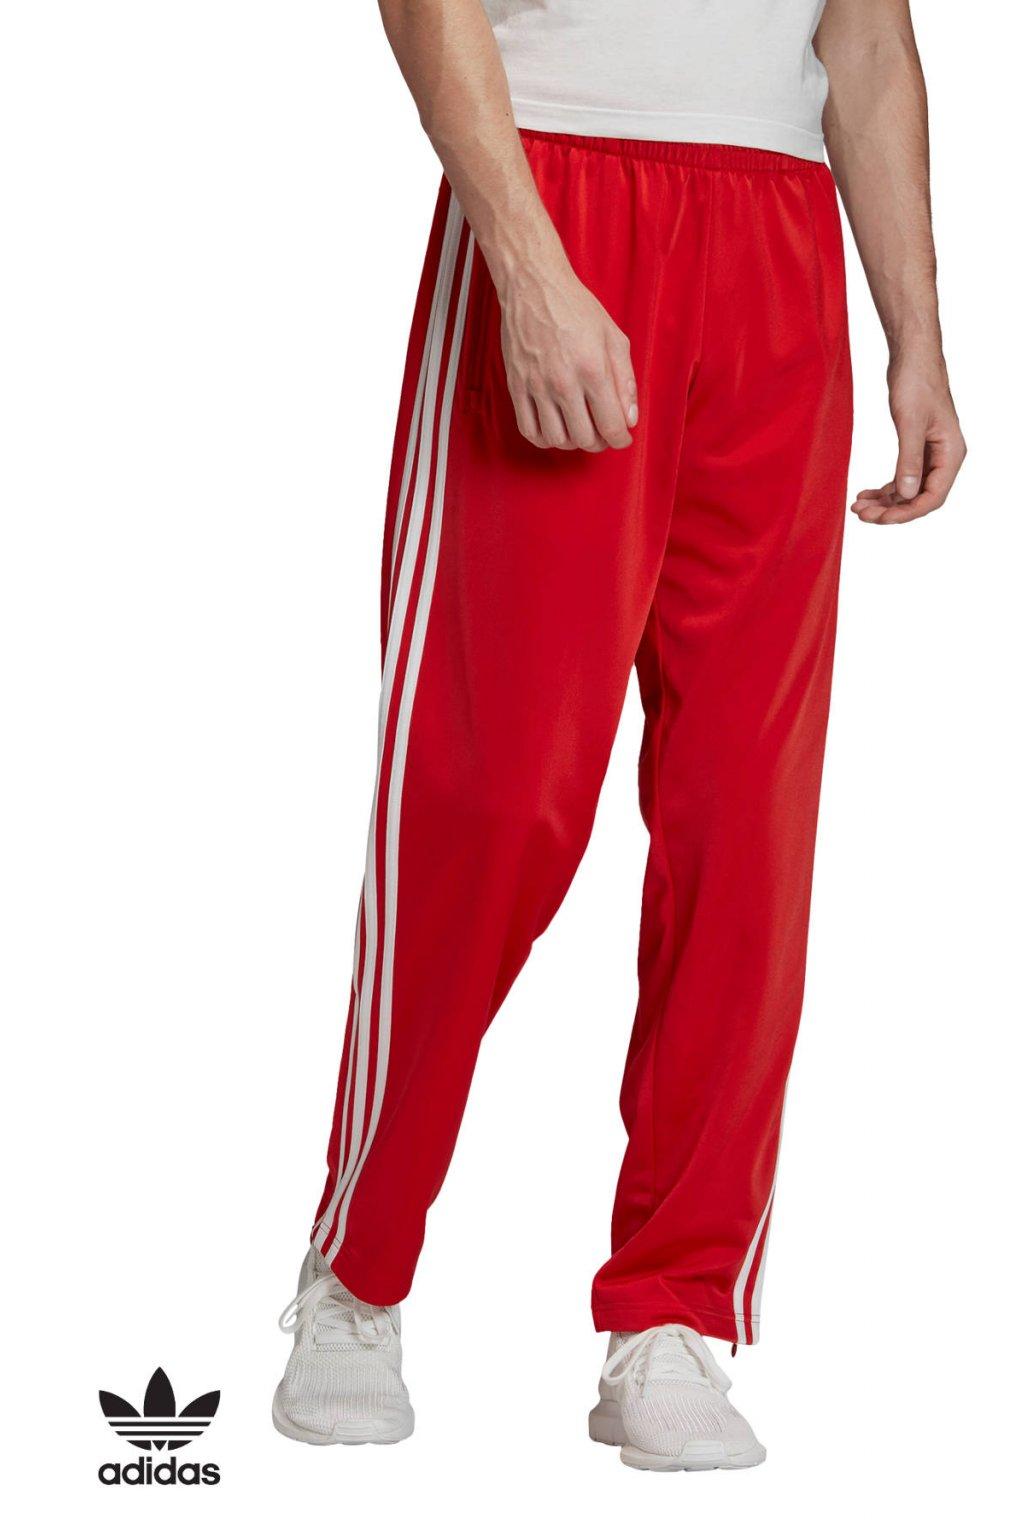 fm3814 panske teplaky adidas sst trackpants cervene